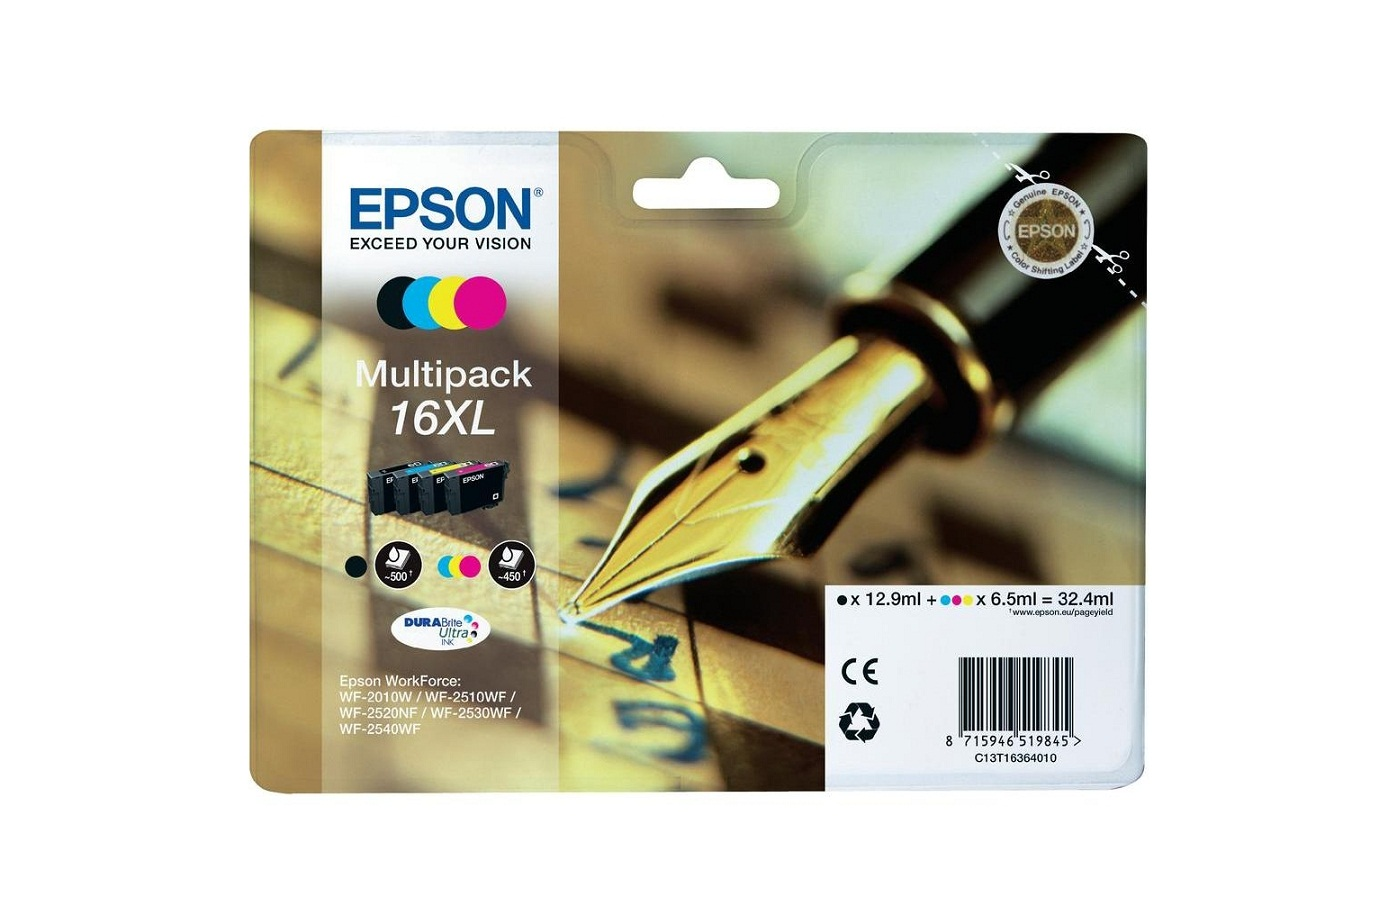 Epson T1636 16XL Series 'Pen and Crossword' multip